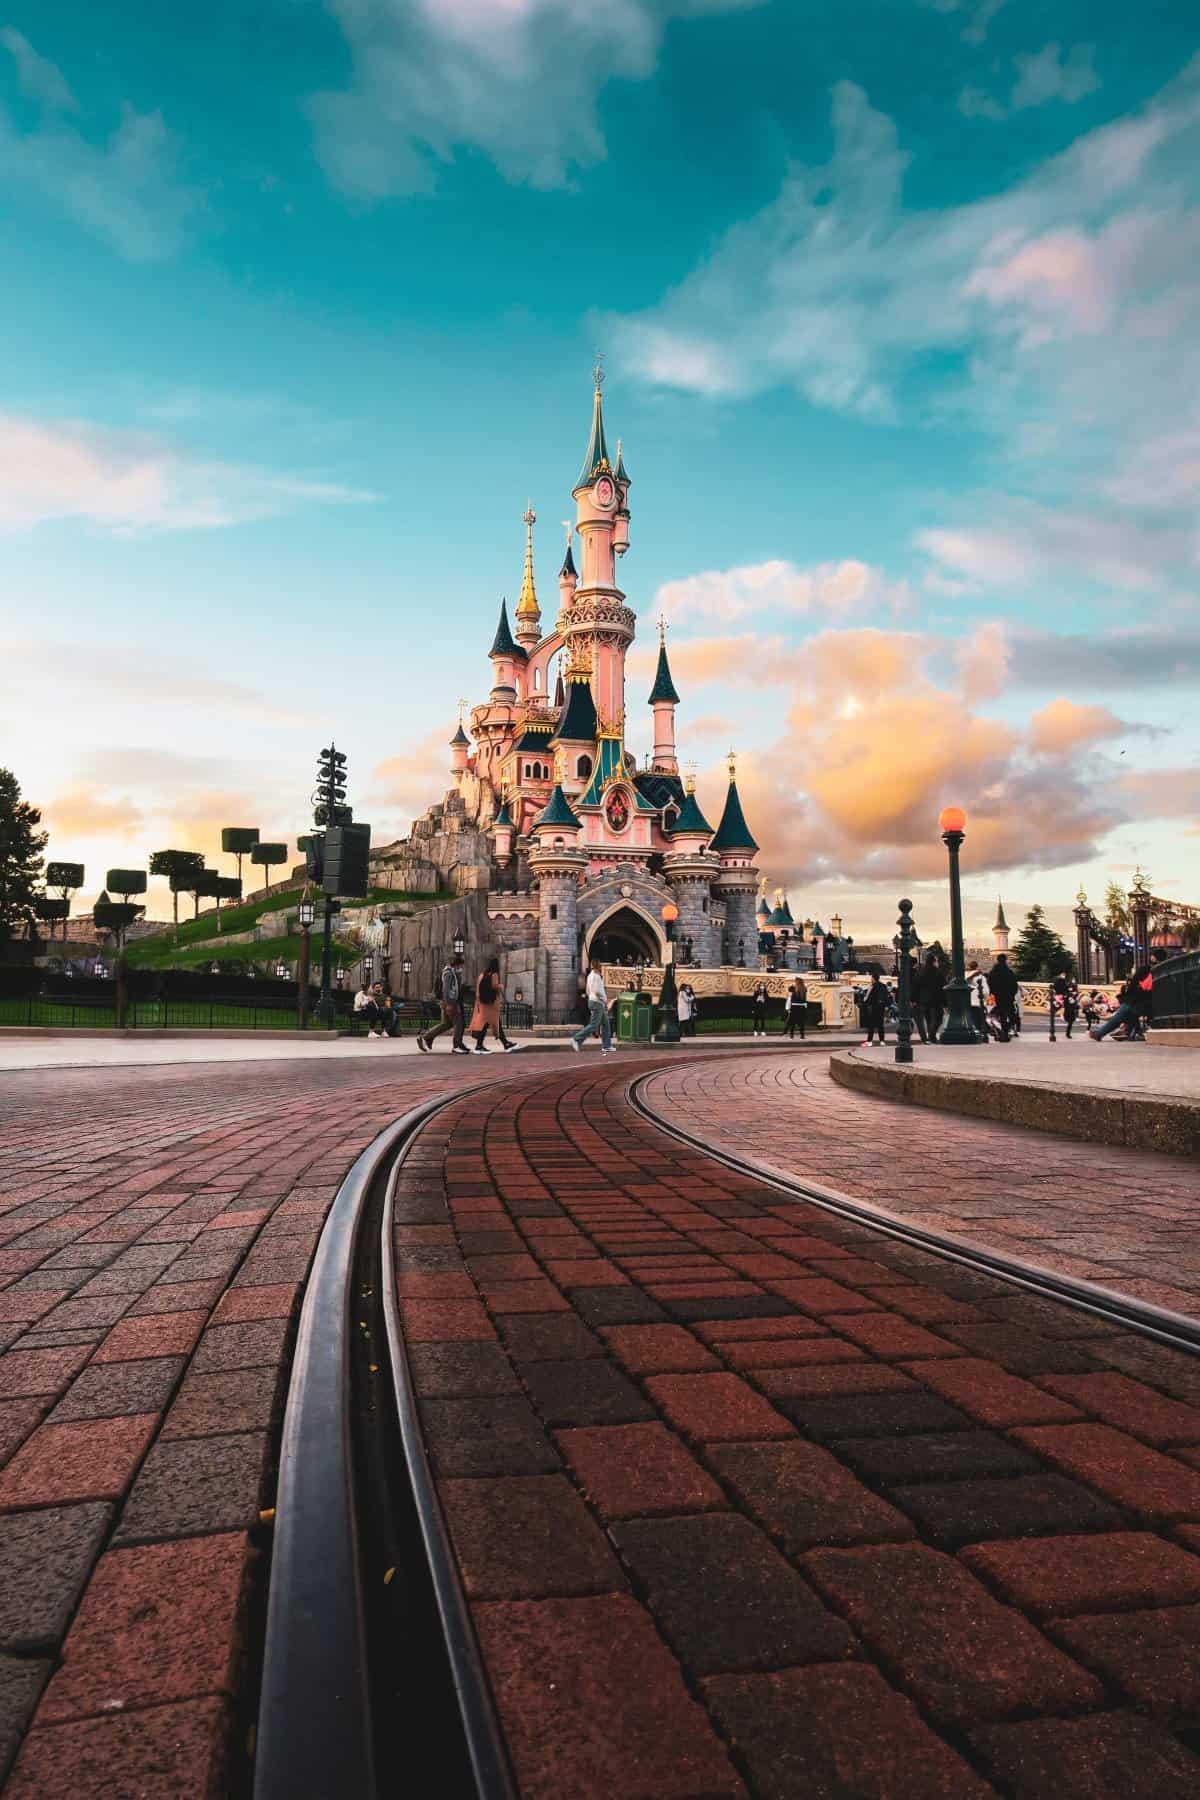 Disneyland, Paris, France is a Family-friendly Destination